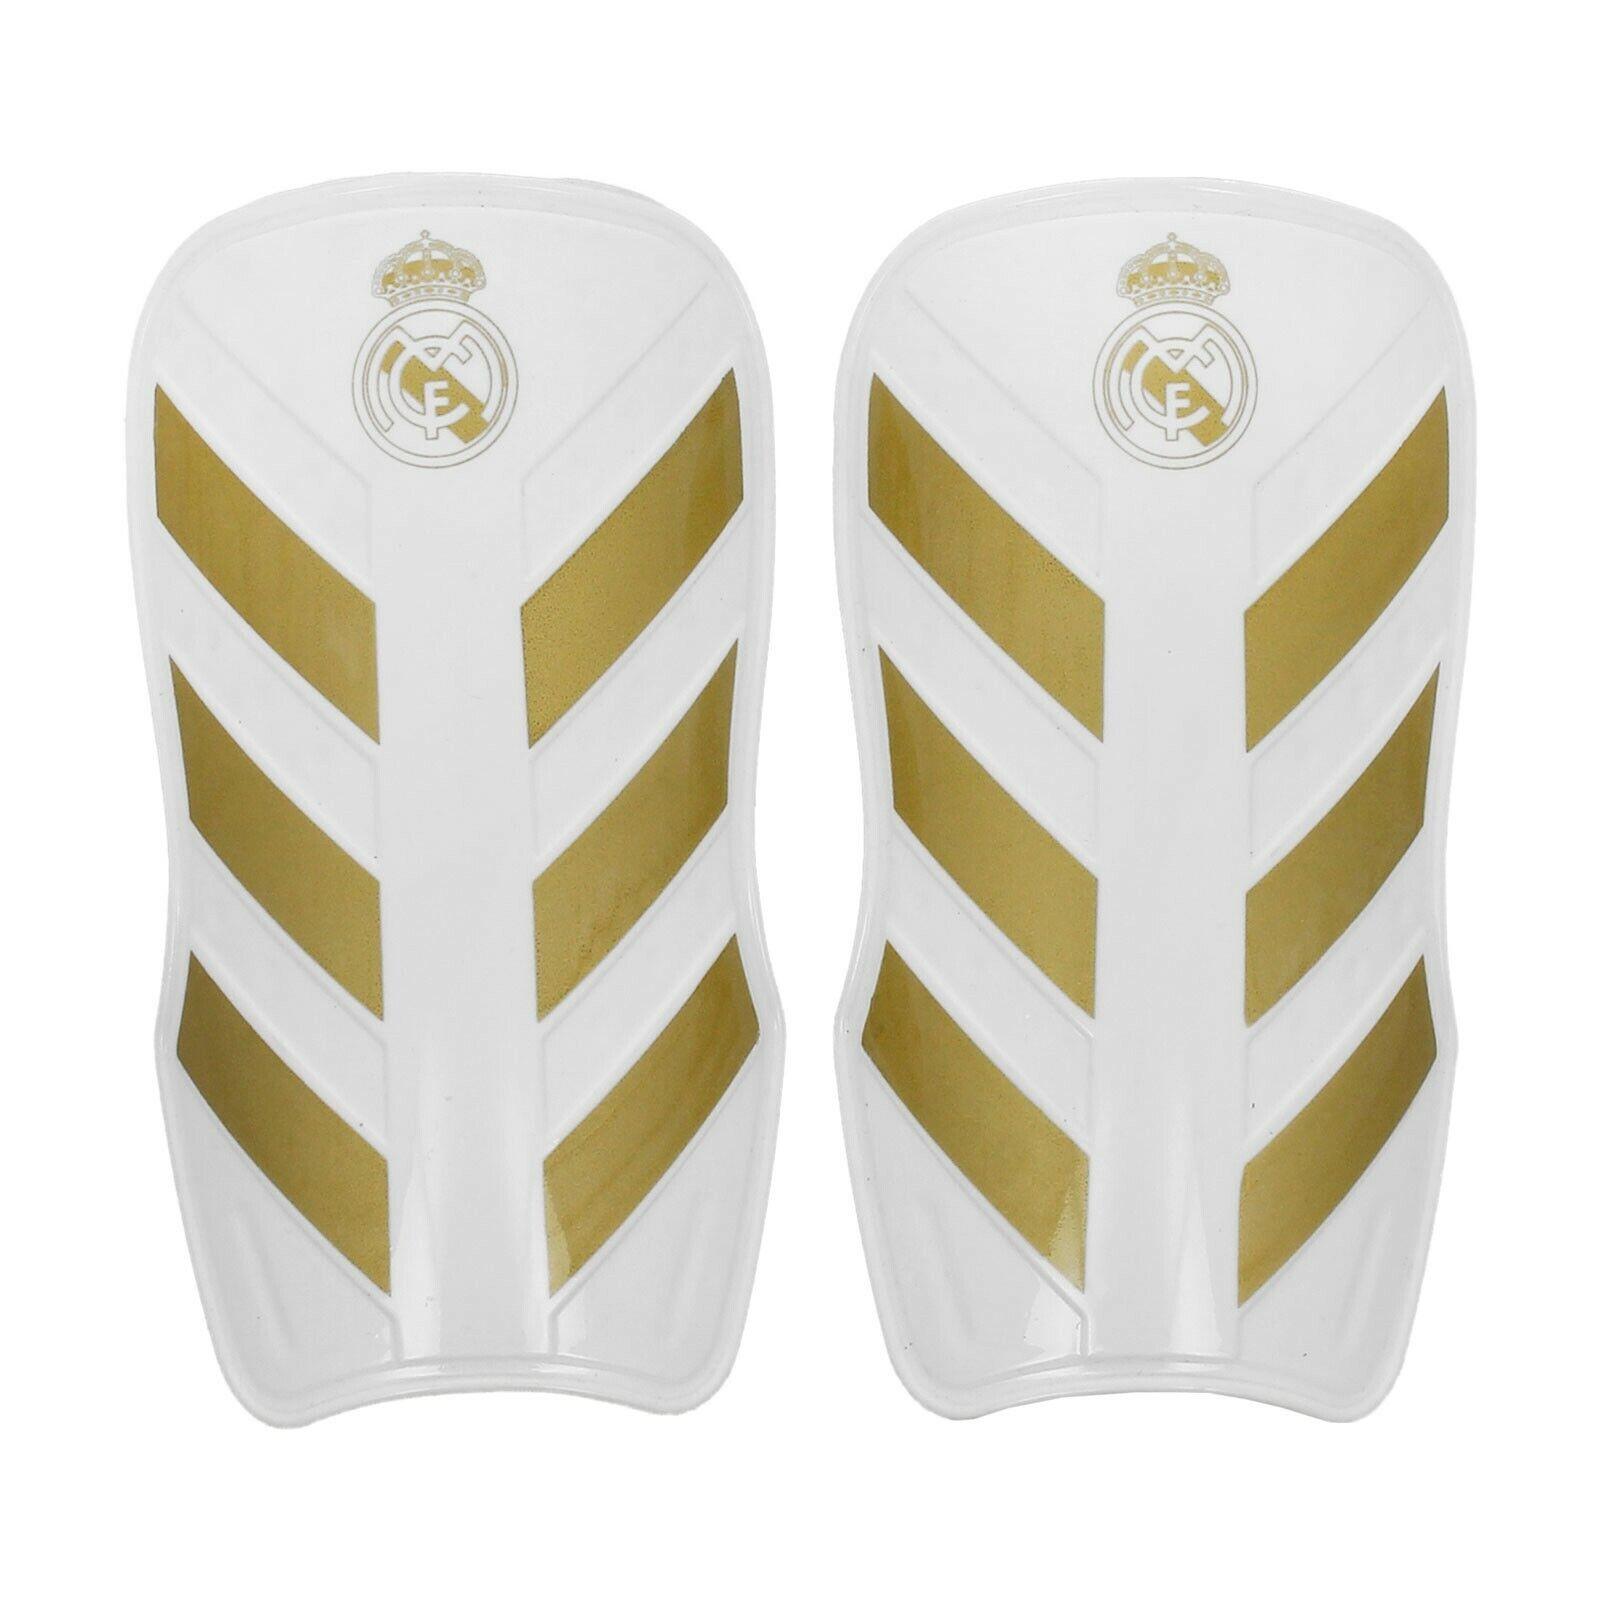 Shin Boy/Man ADIDAS Art. DY0082 Mod. X Pro Real Madrid - 19,95€